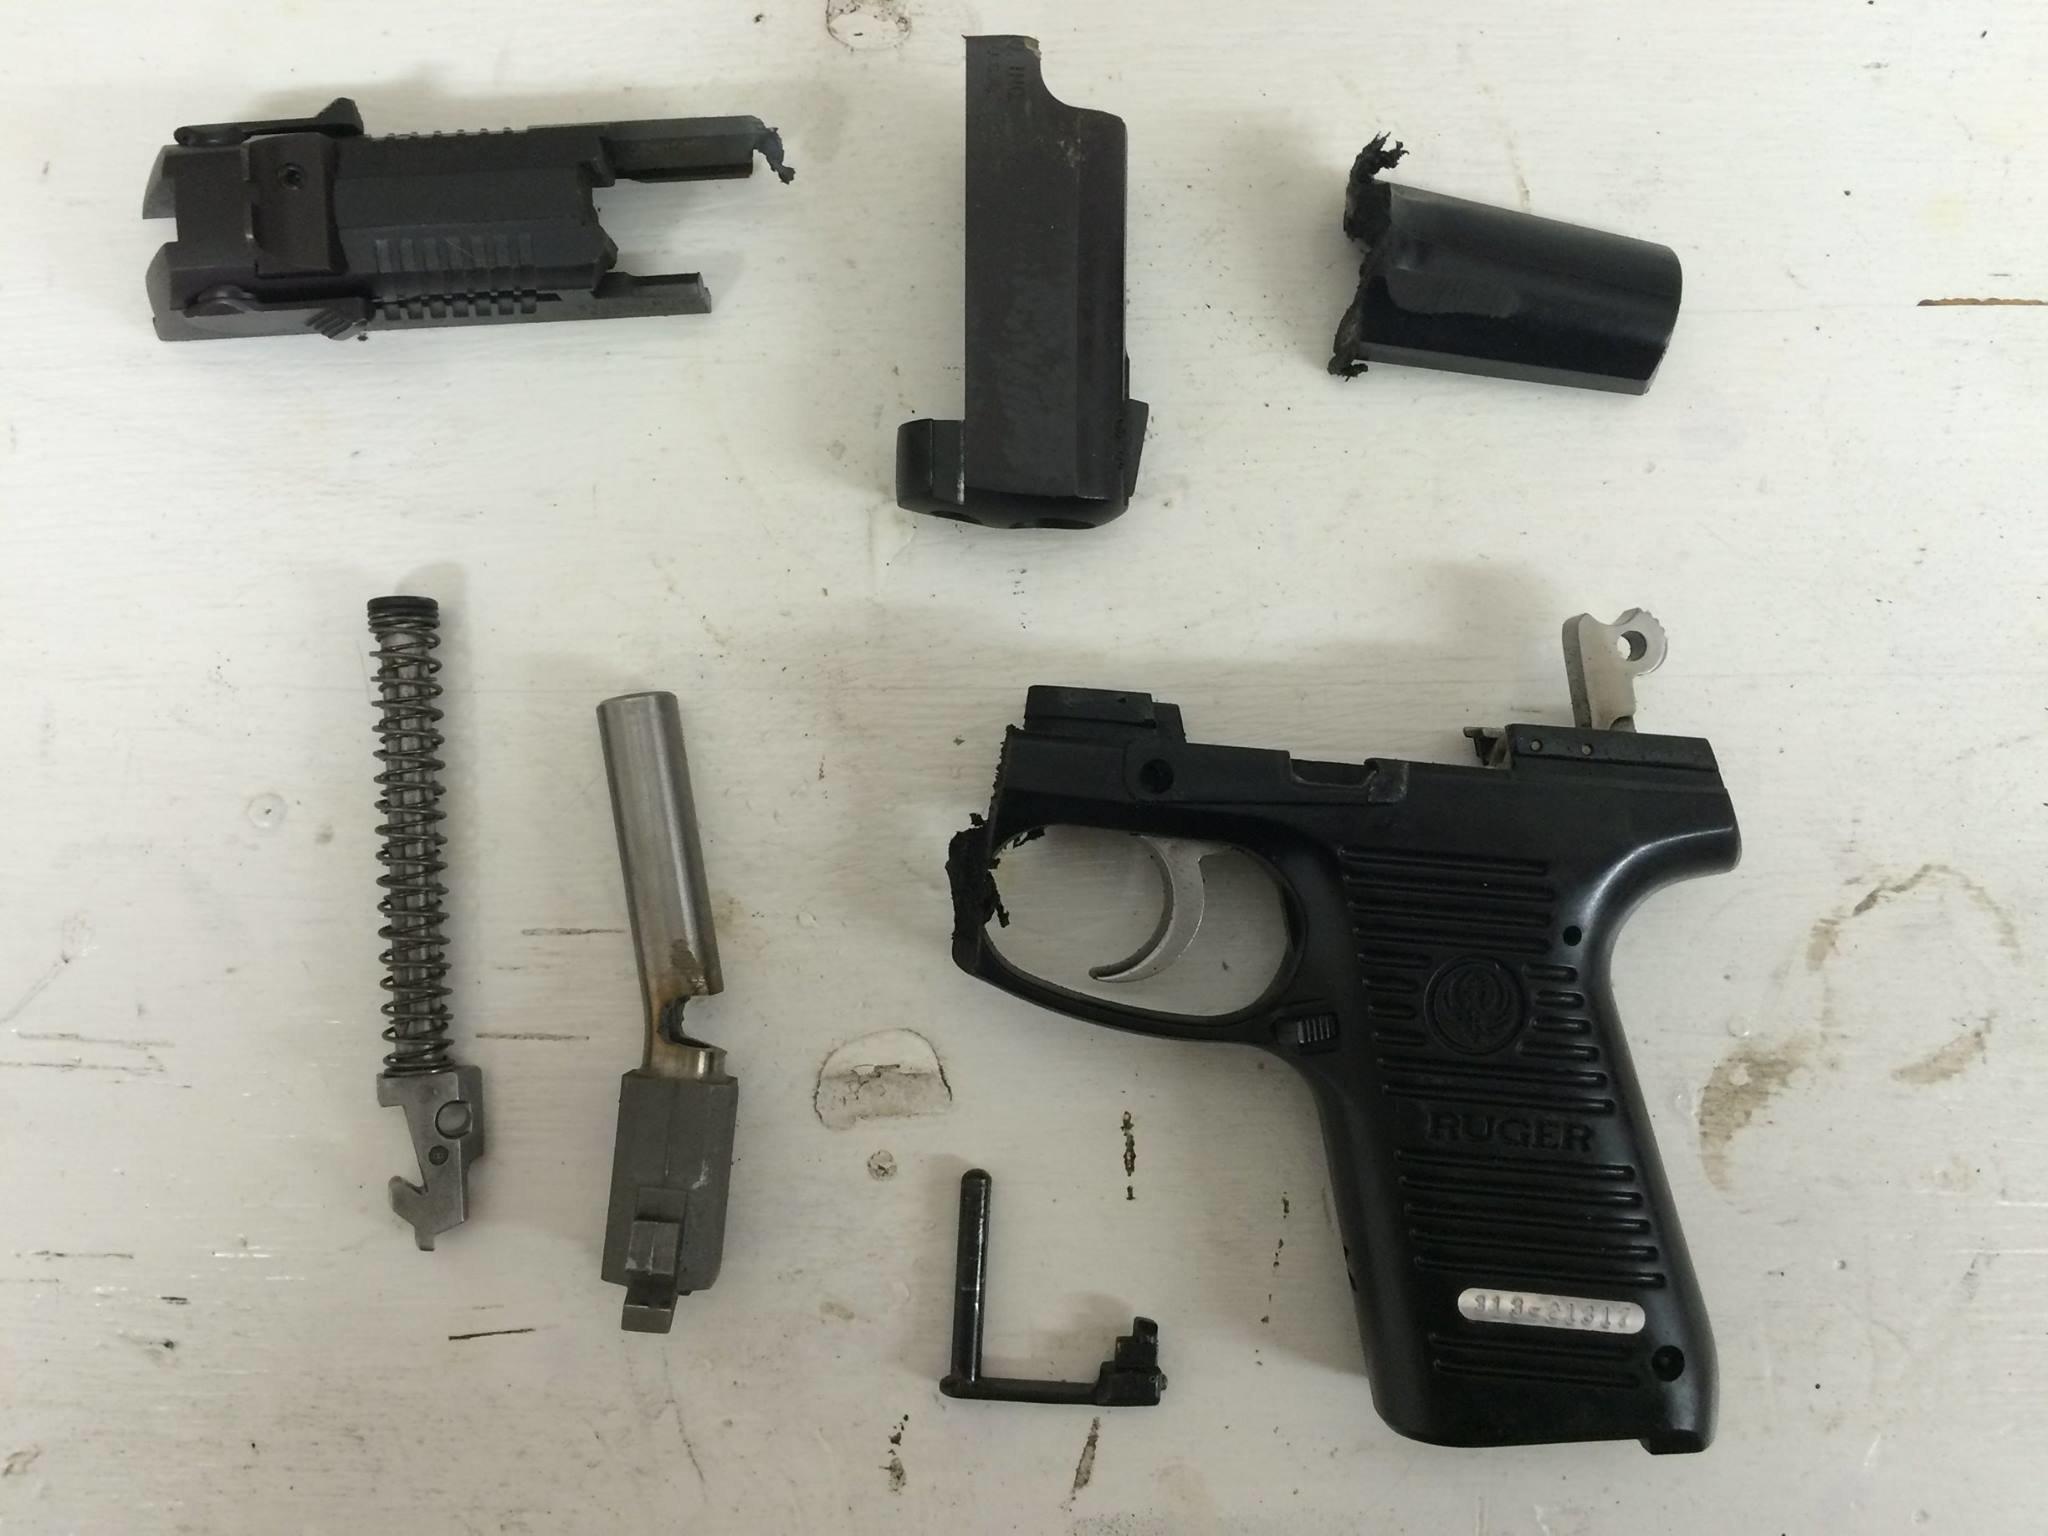 Steve Elliott explained his decision to destroy his handgun in a Monday Facebook post.